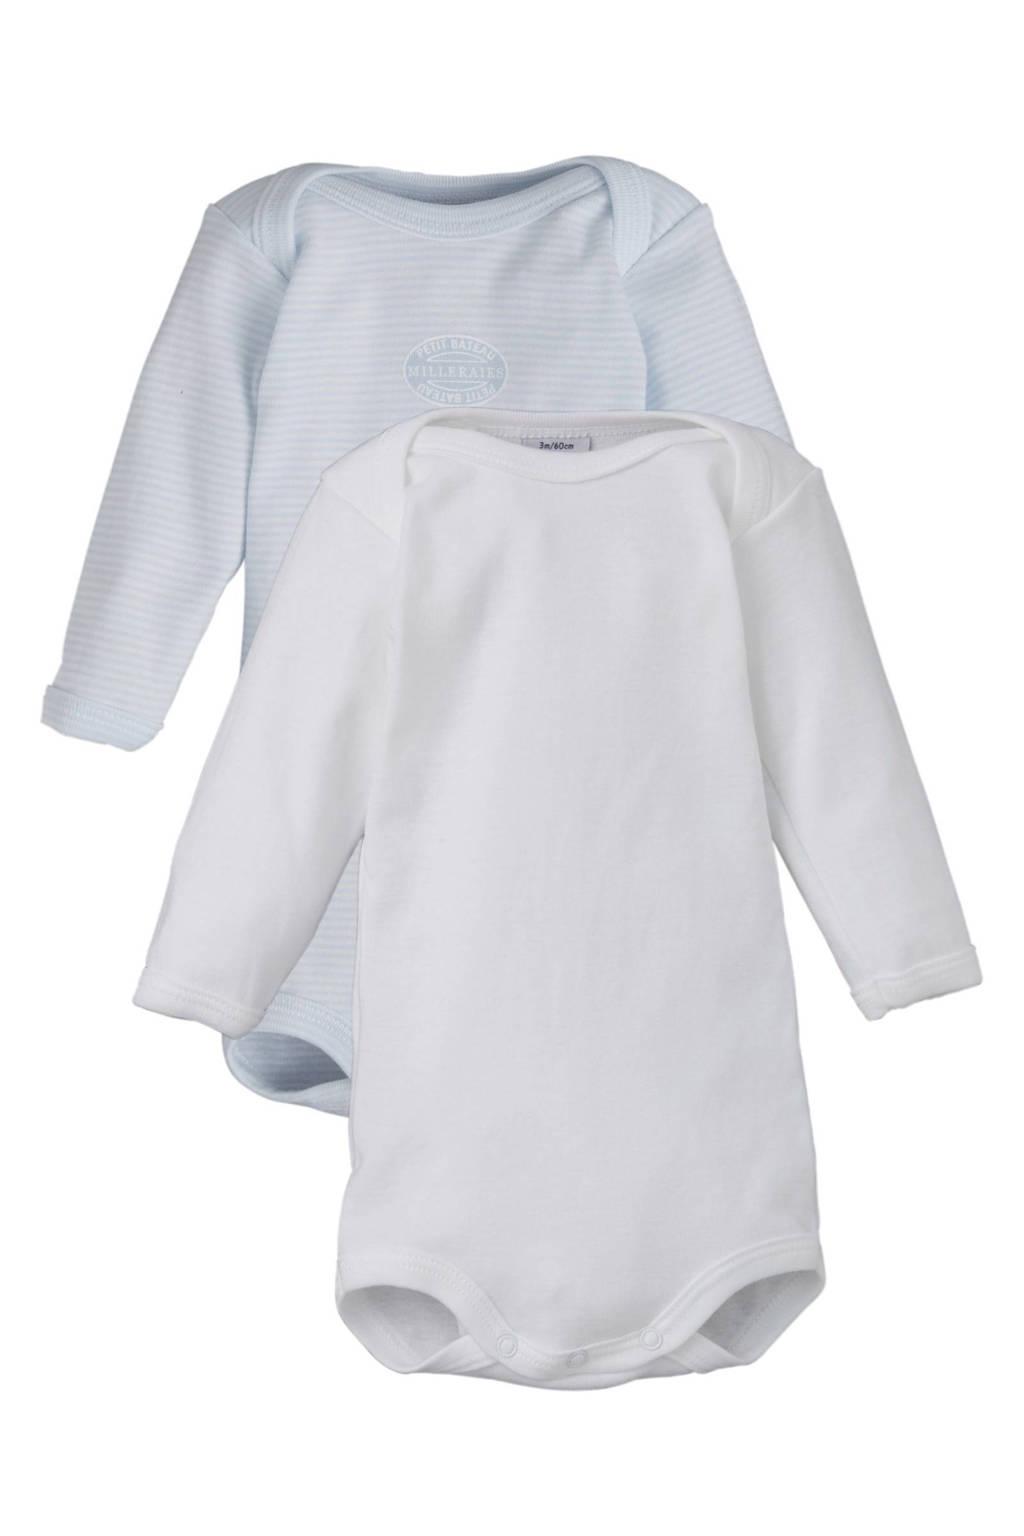 Petit Bateau newborn baby romper, Blauw / Wit